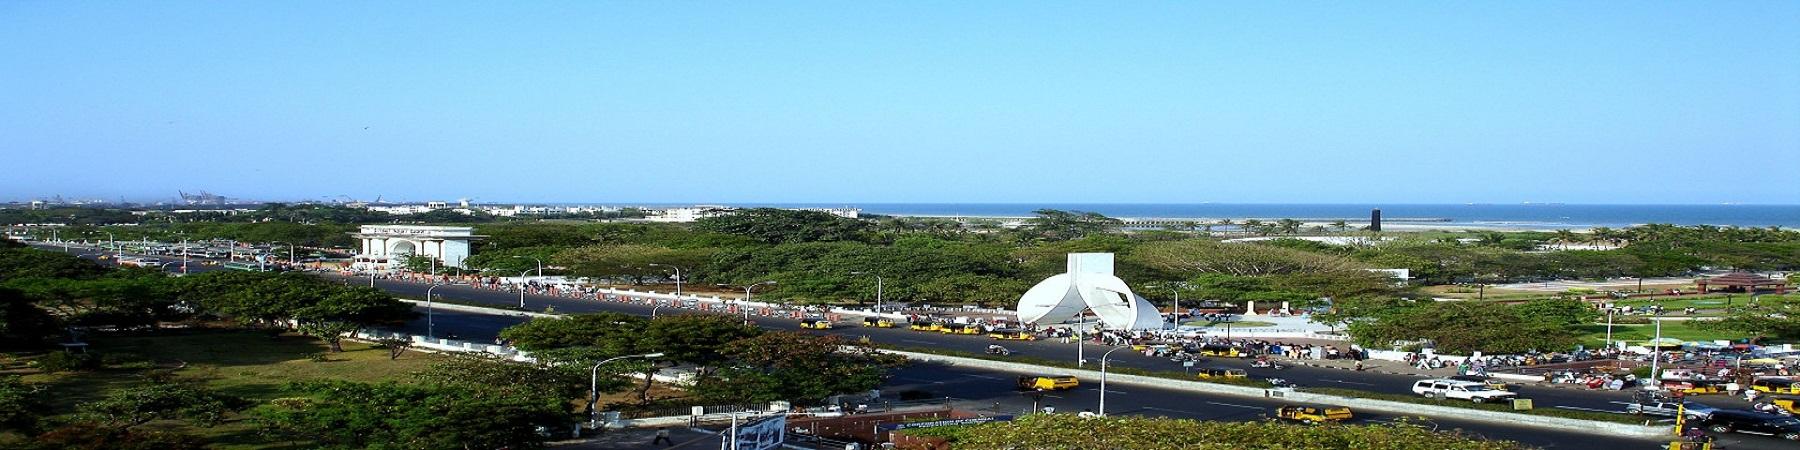 Beach Memorials